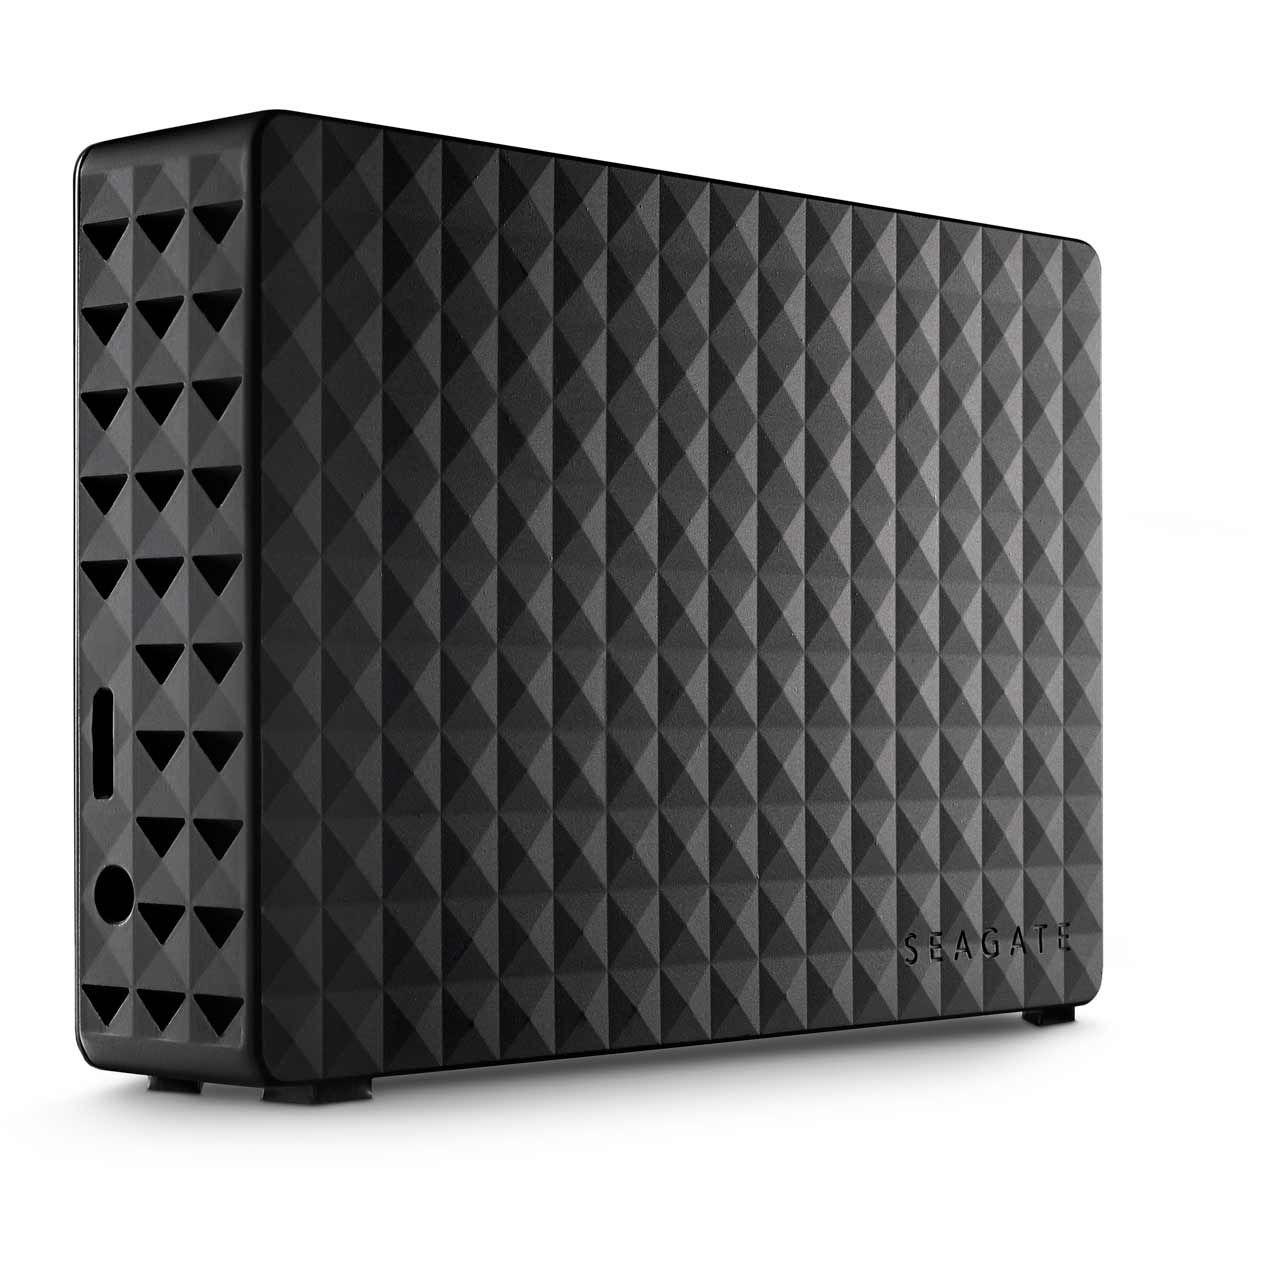 Seagate Expansion 3TB Desktop Hard Drive - Black £74 @ AO